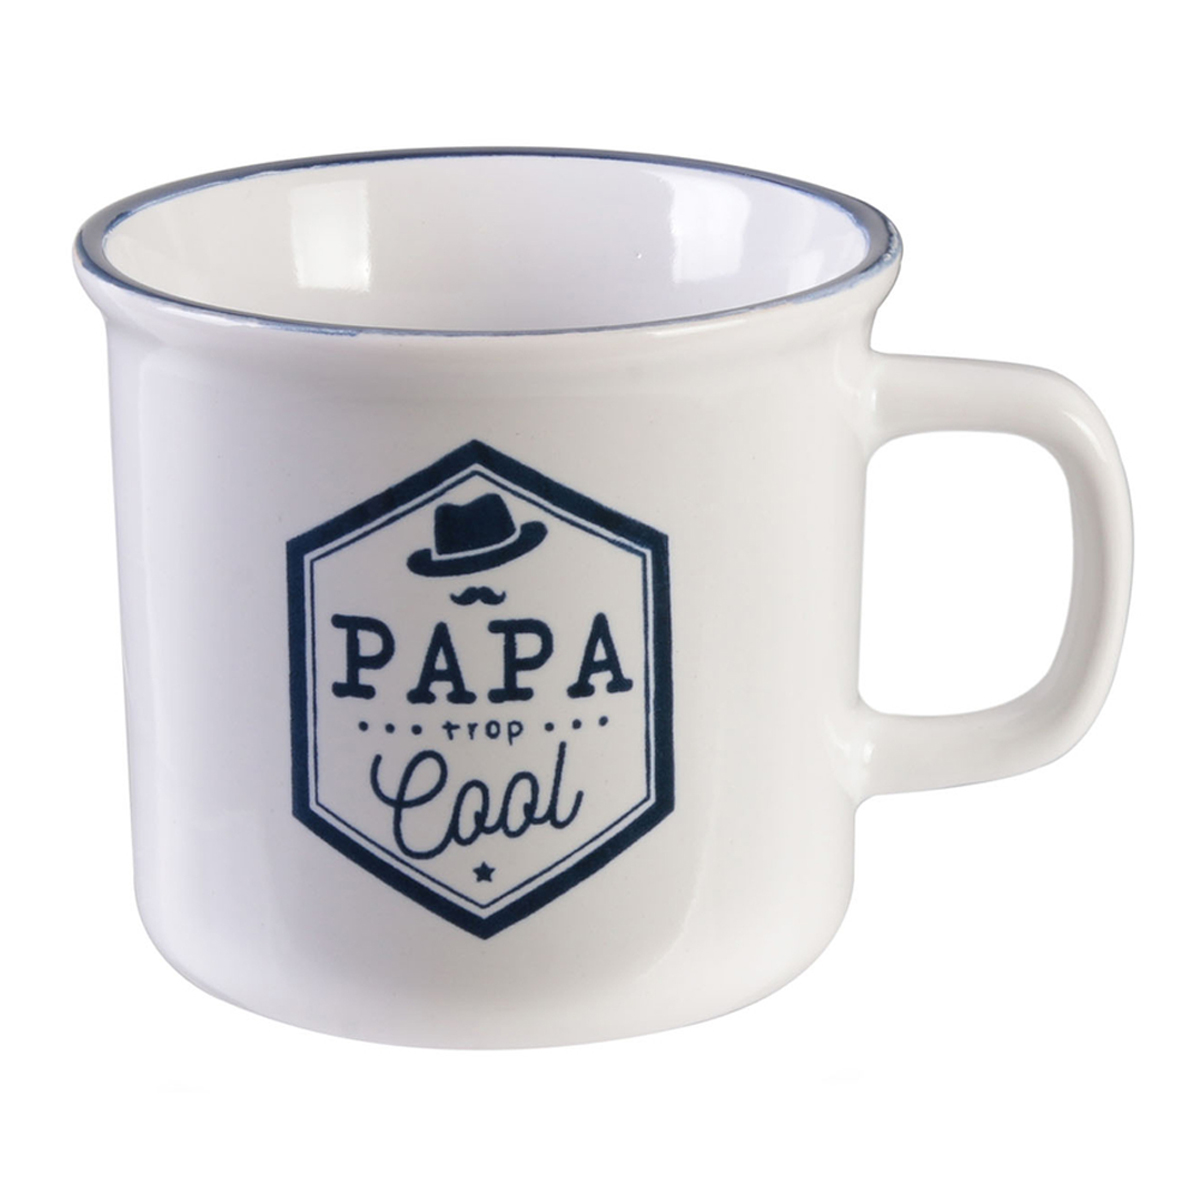 Mug tendresse céramique \'Papa\' bleu blanc (Papa trop cool) - 8x9 cm (30 cl) - [R2882]